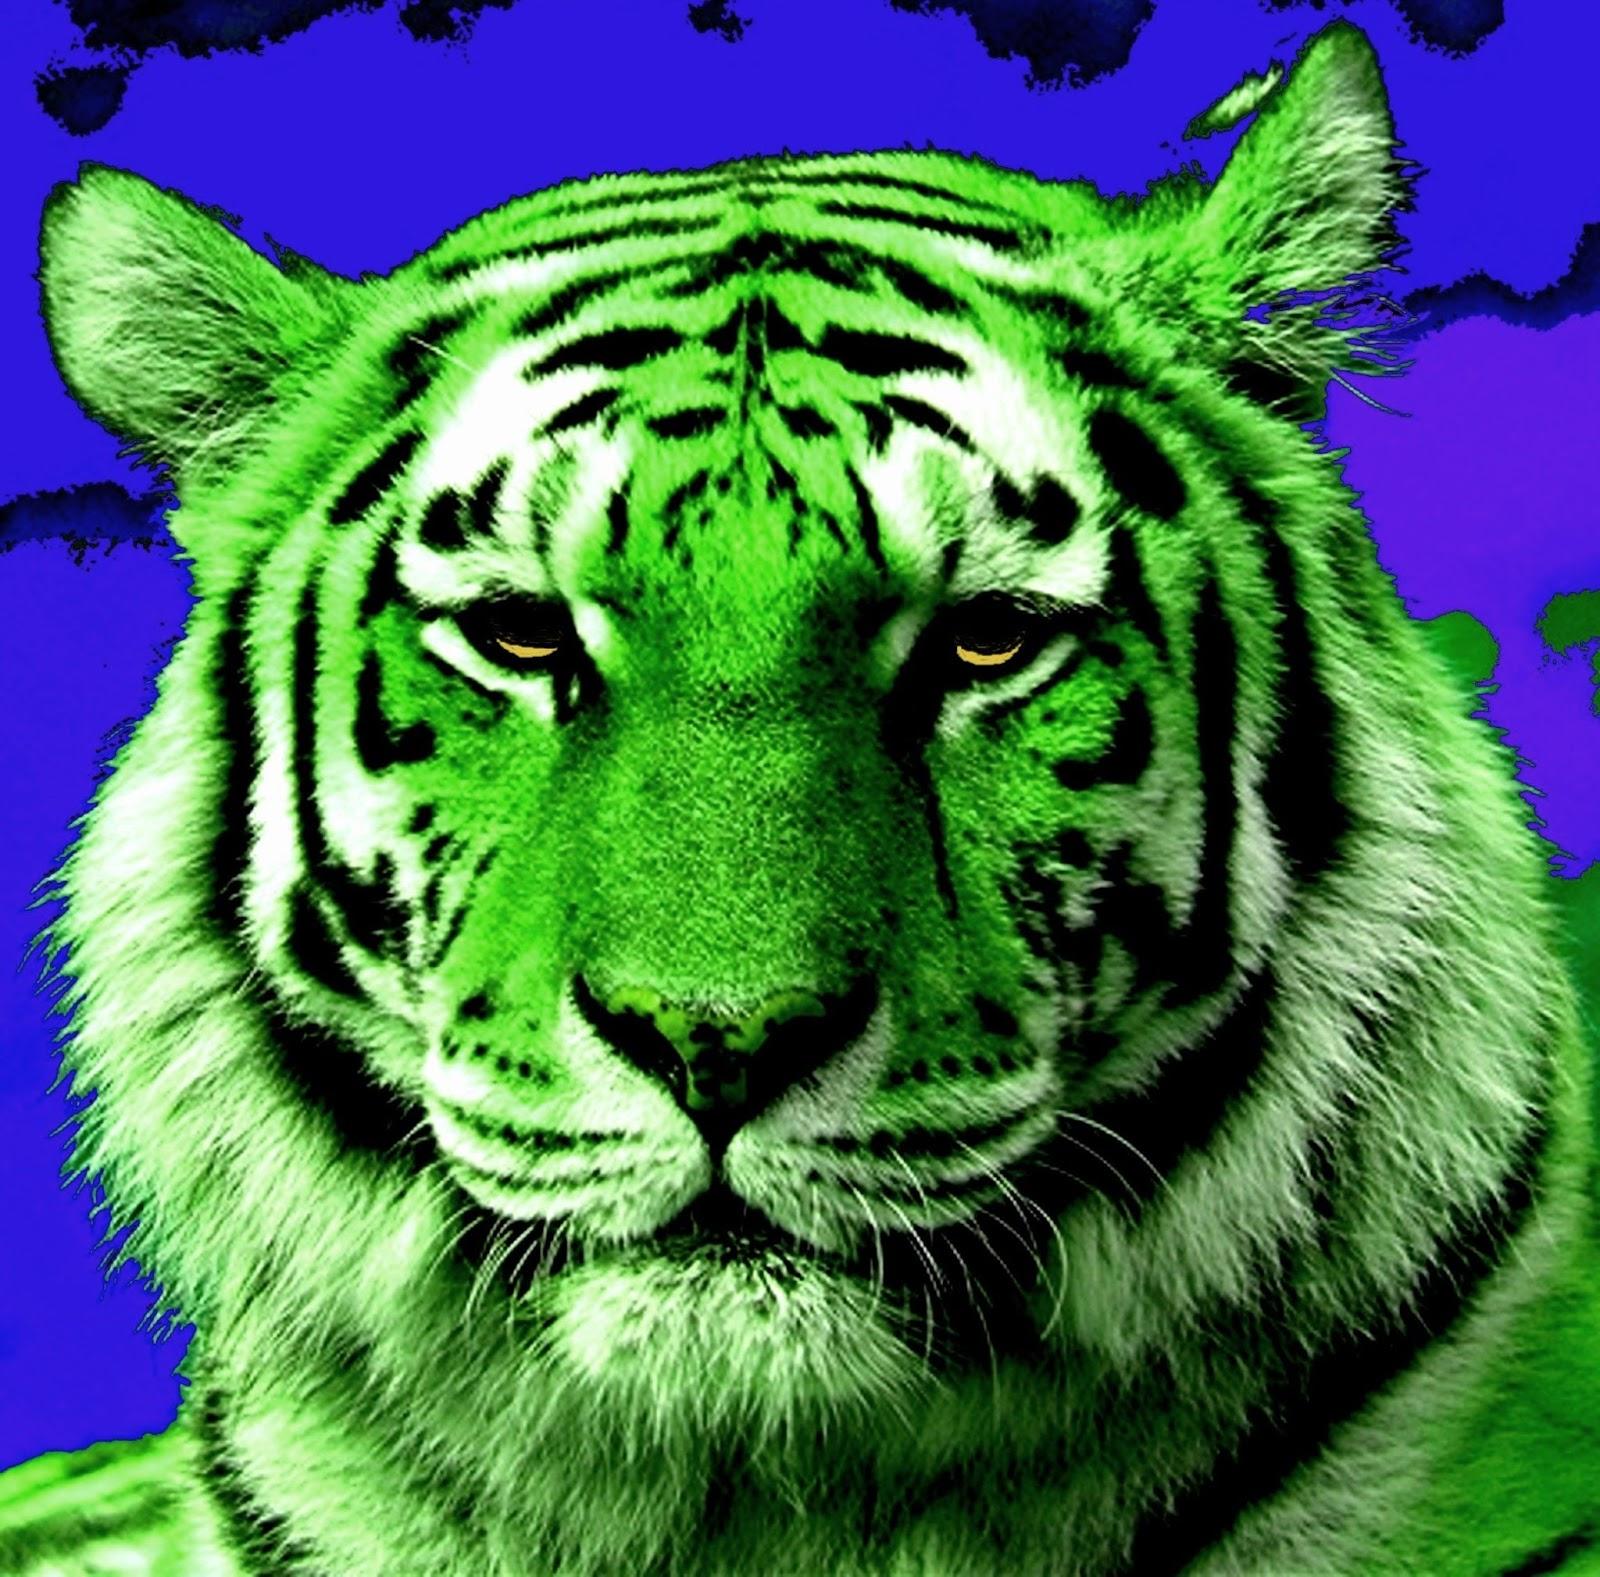 Green tiger eyes - photo#46